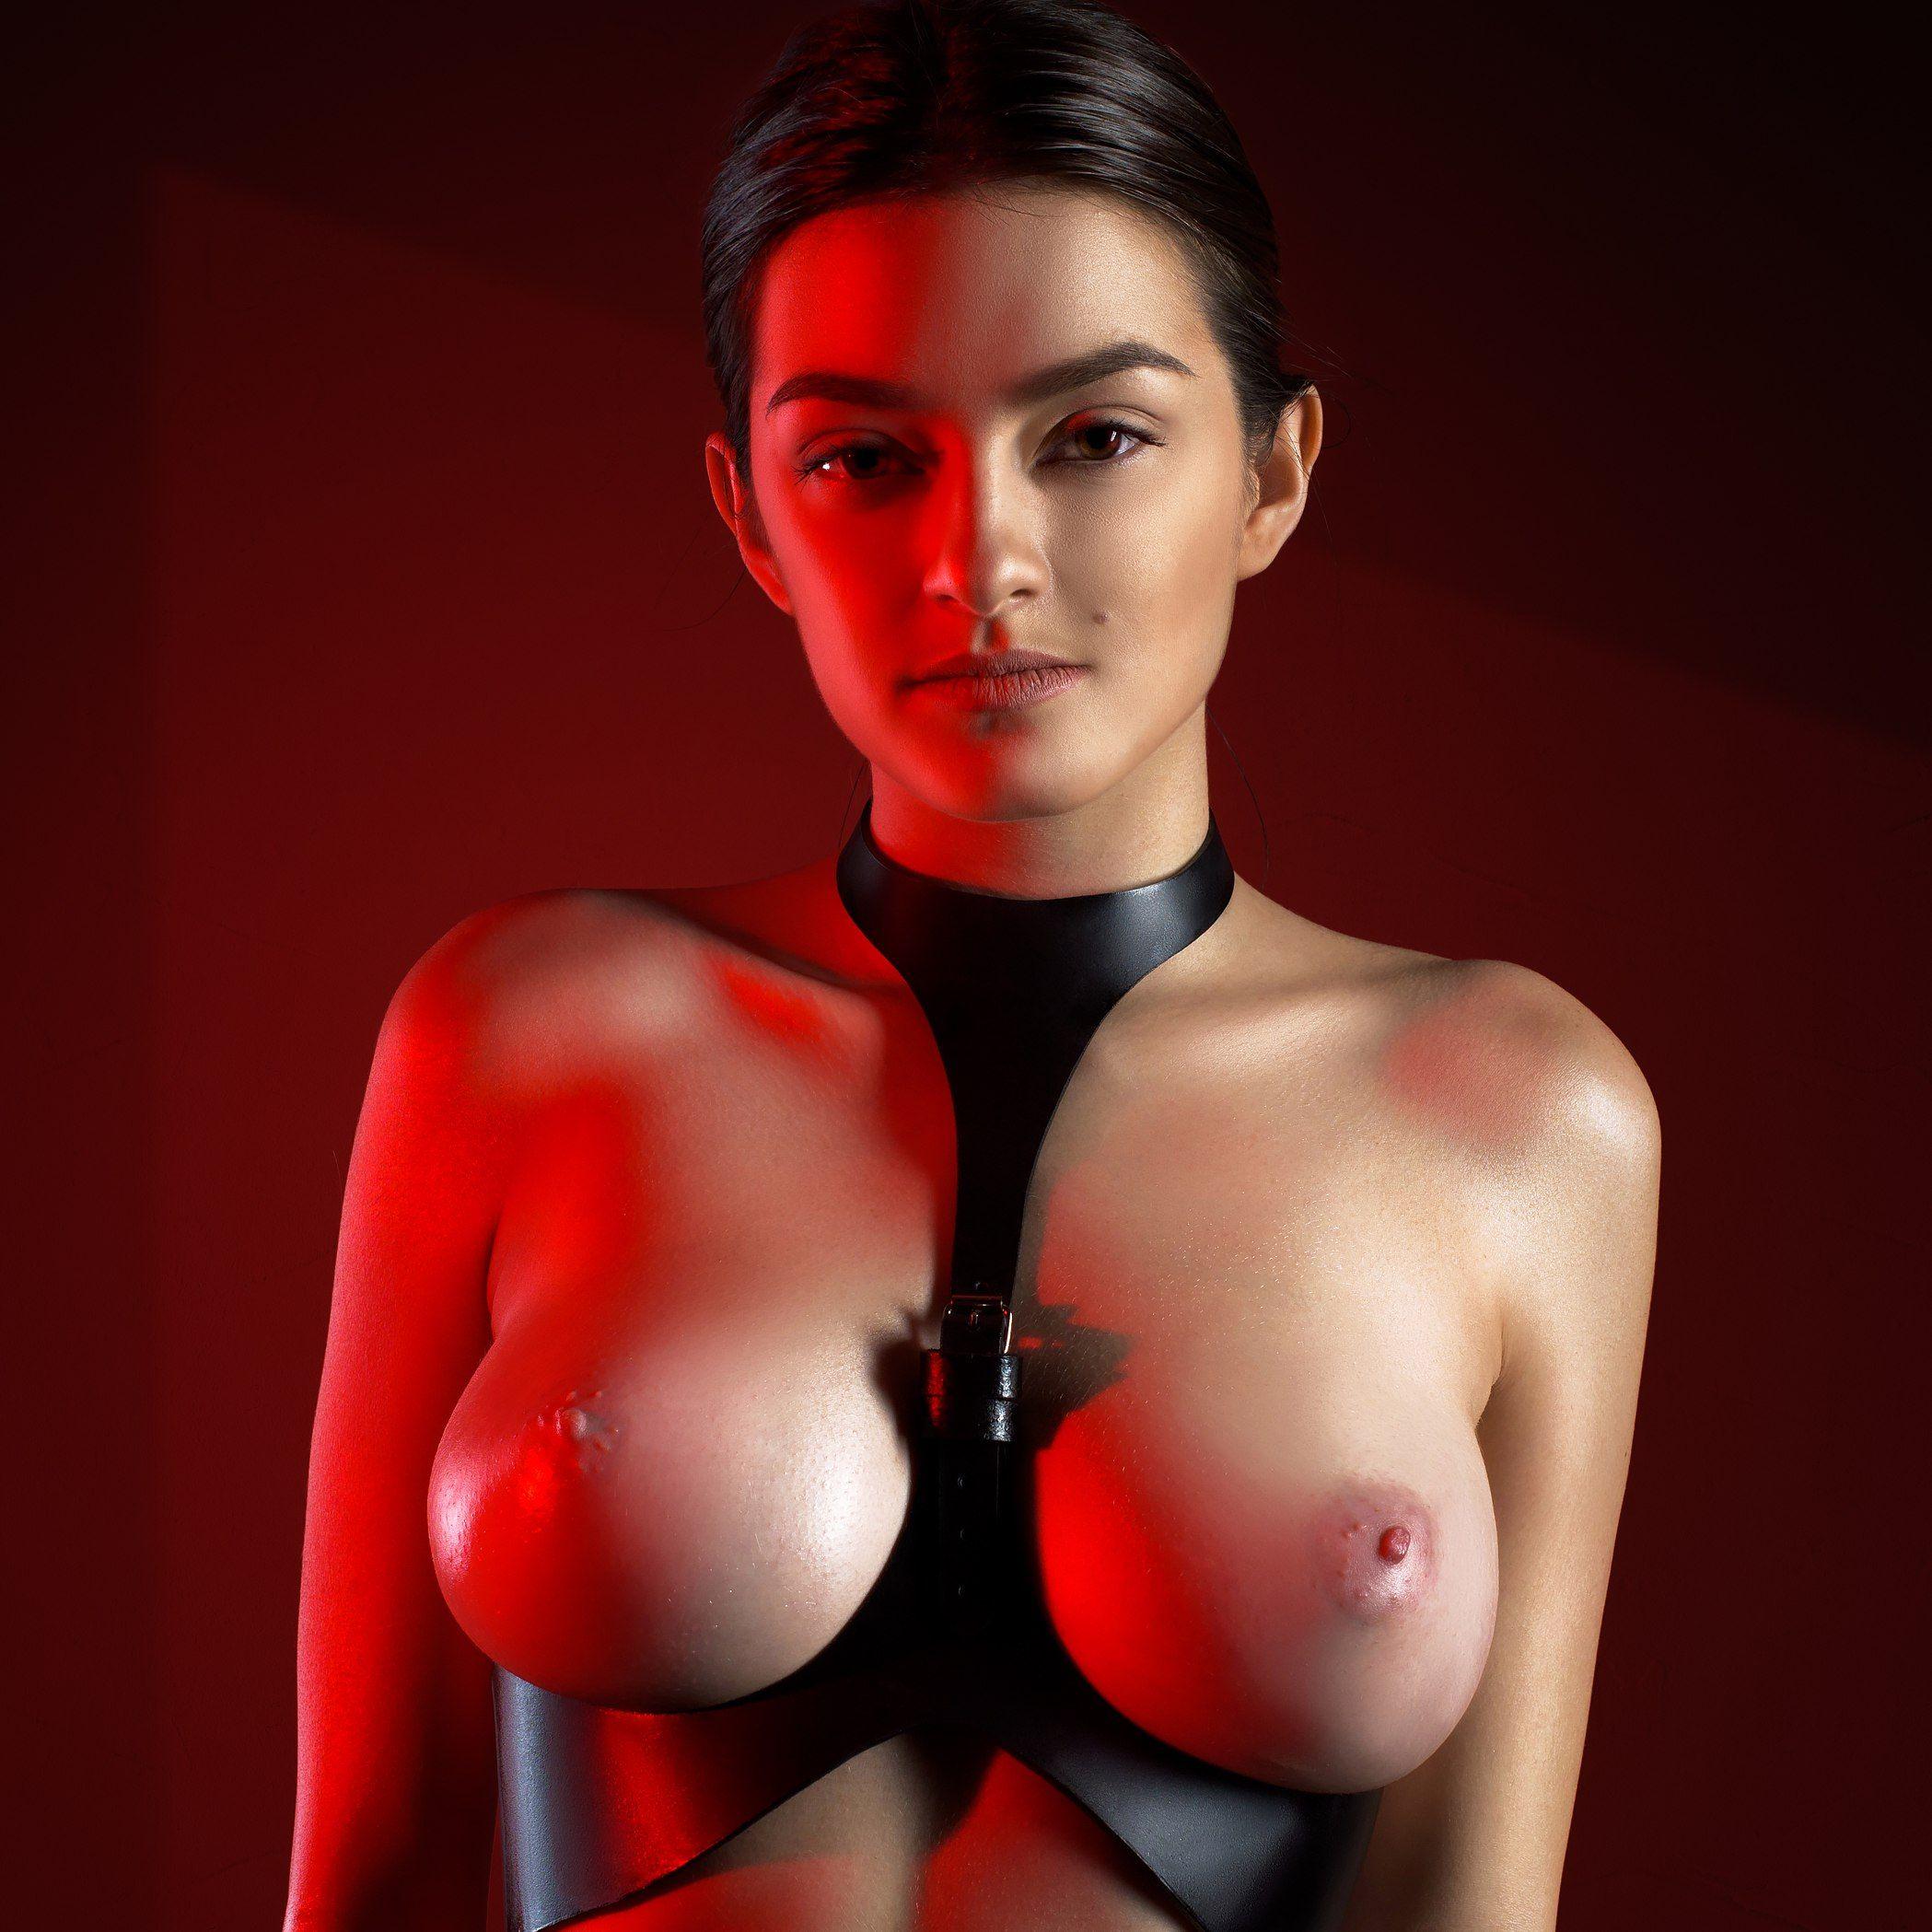 Pussy Marina Valmont nudes (58 photos), Ass, Bikini, Feet, in bikini 2018